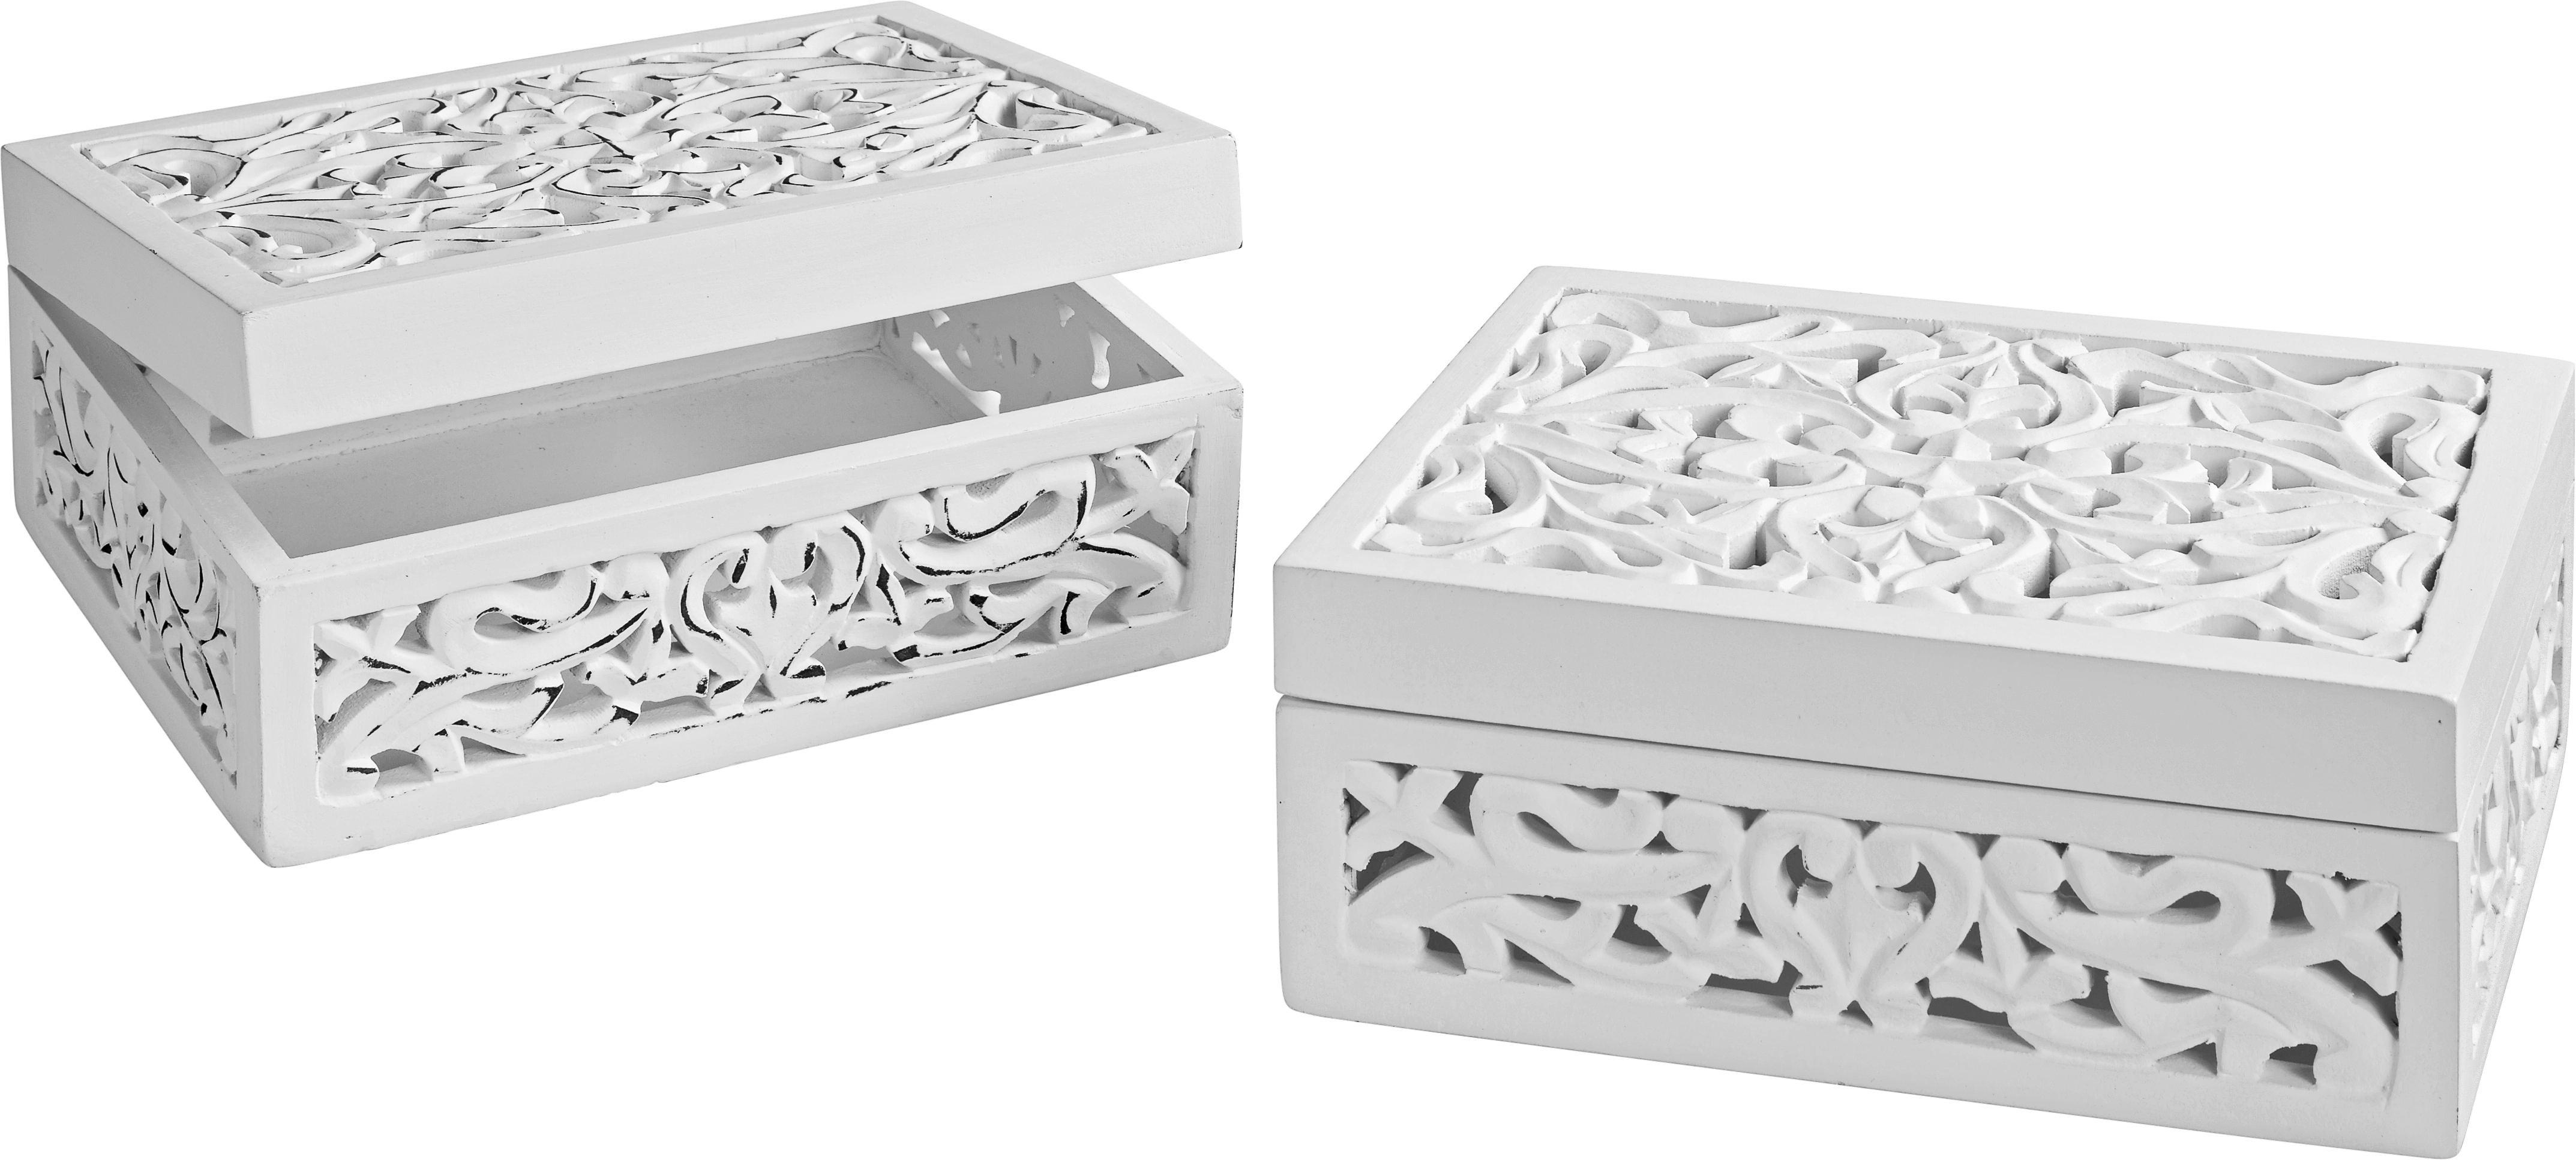 Dekobox Krishna aus Echtholz - Weiß, ROMANTIK / LANDHAUS, Holz/Holzwerkstoff (25/20/10cm) - MÖMAX modern living